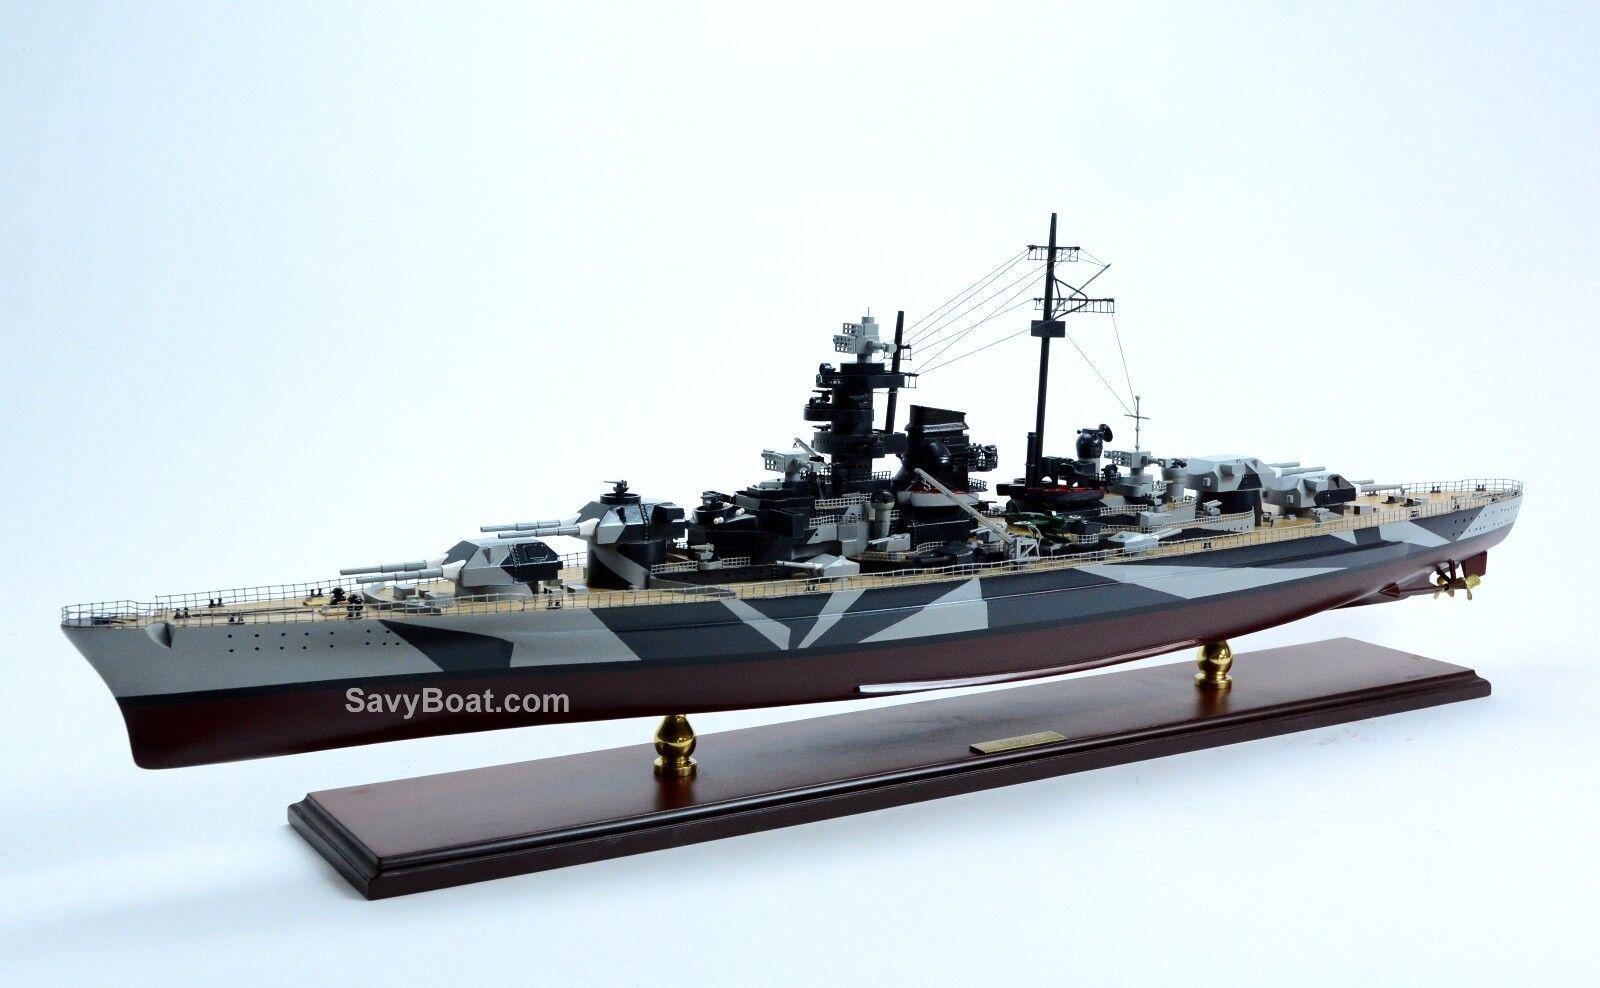 German Battleship Tirpitz. The fate of the battleship Tirpitz 87